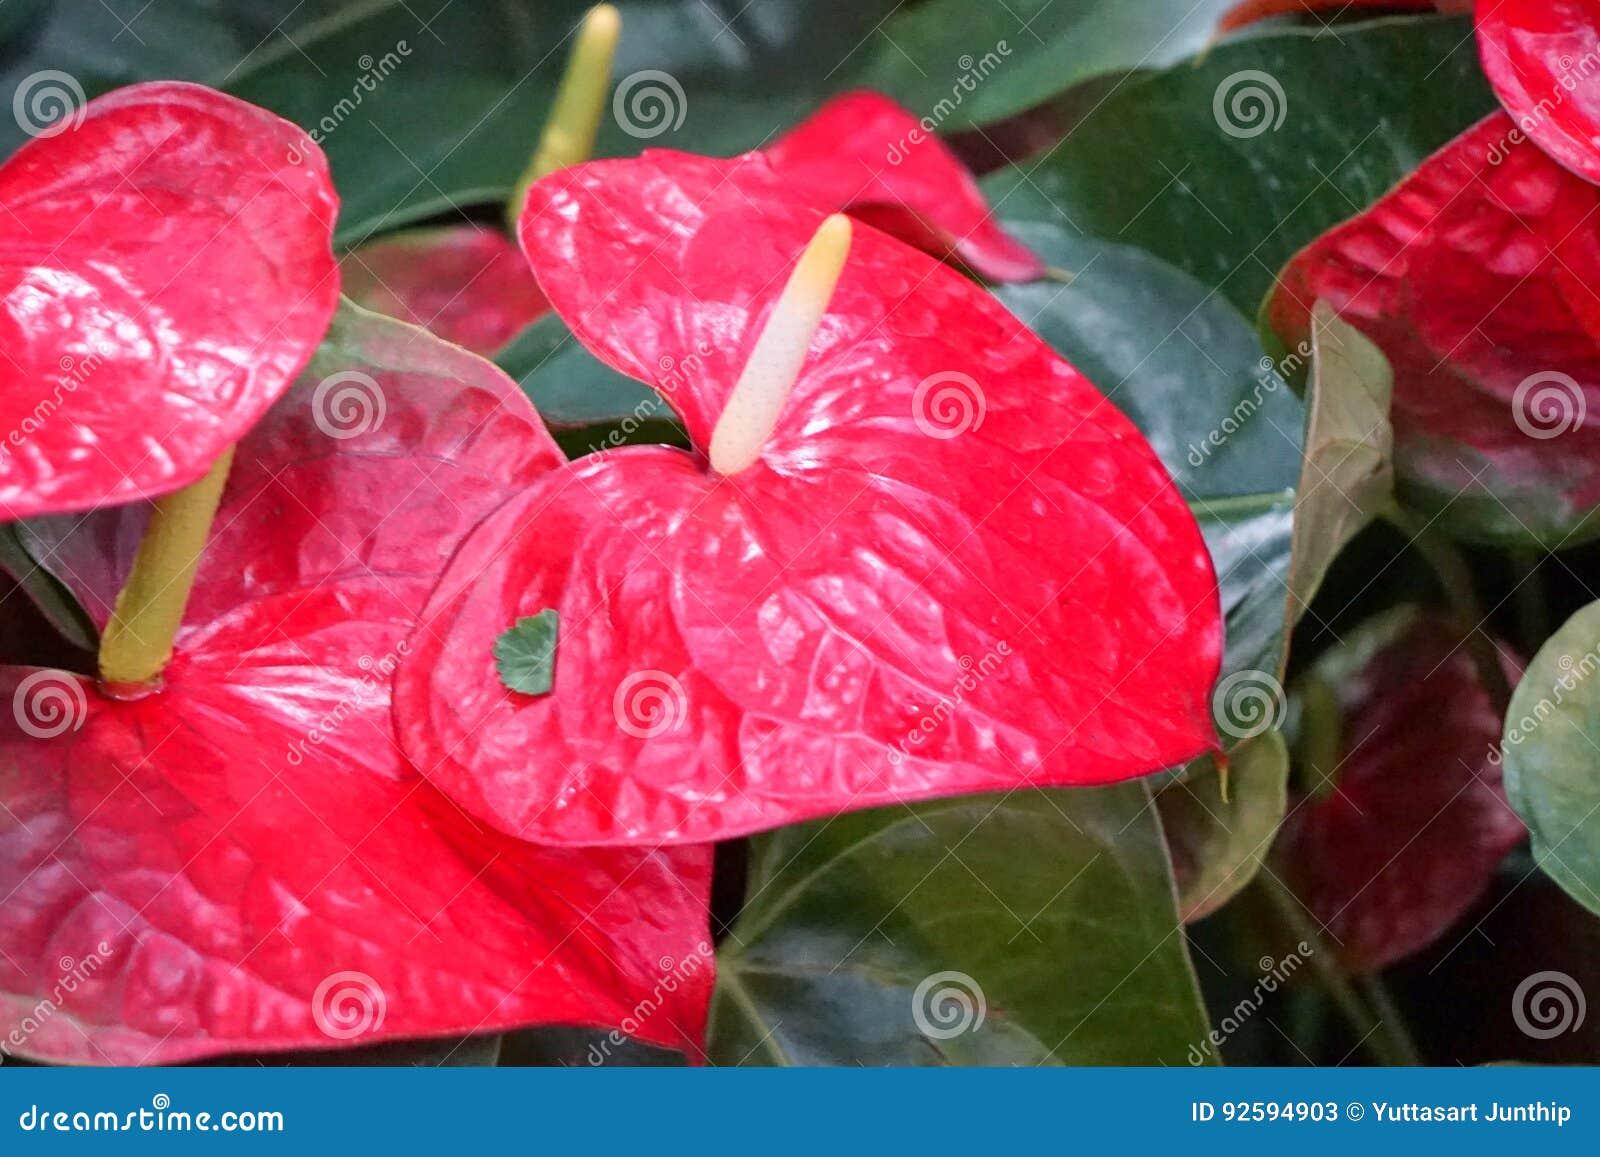 Flamingo flower stock image image of names floral color 92594903 download flamingo flower stock image image of names floral color 92594903 mightylinksfo